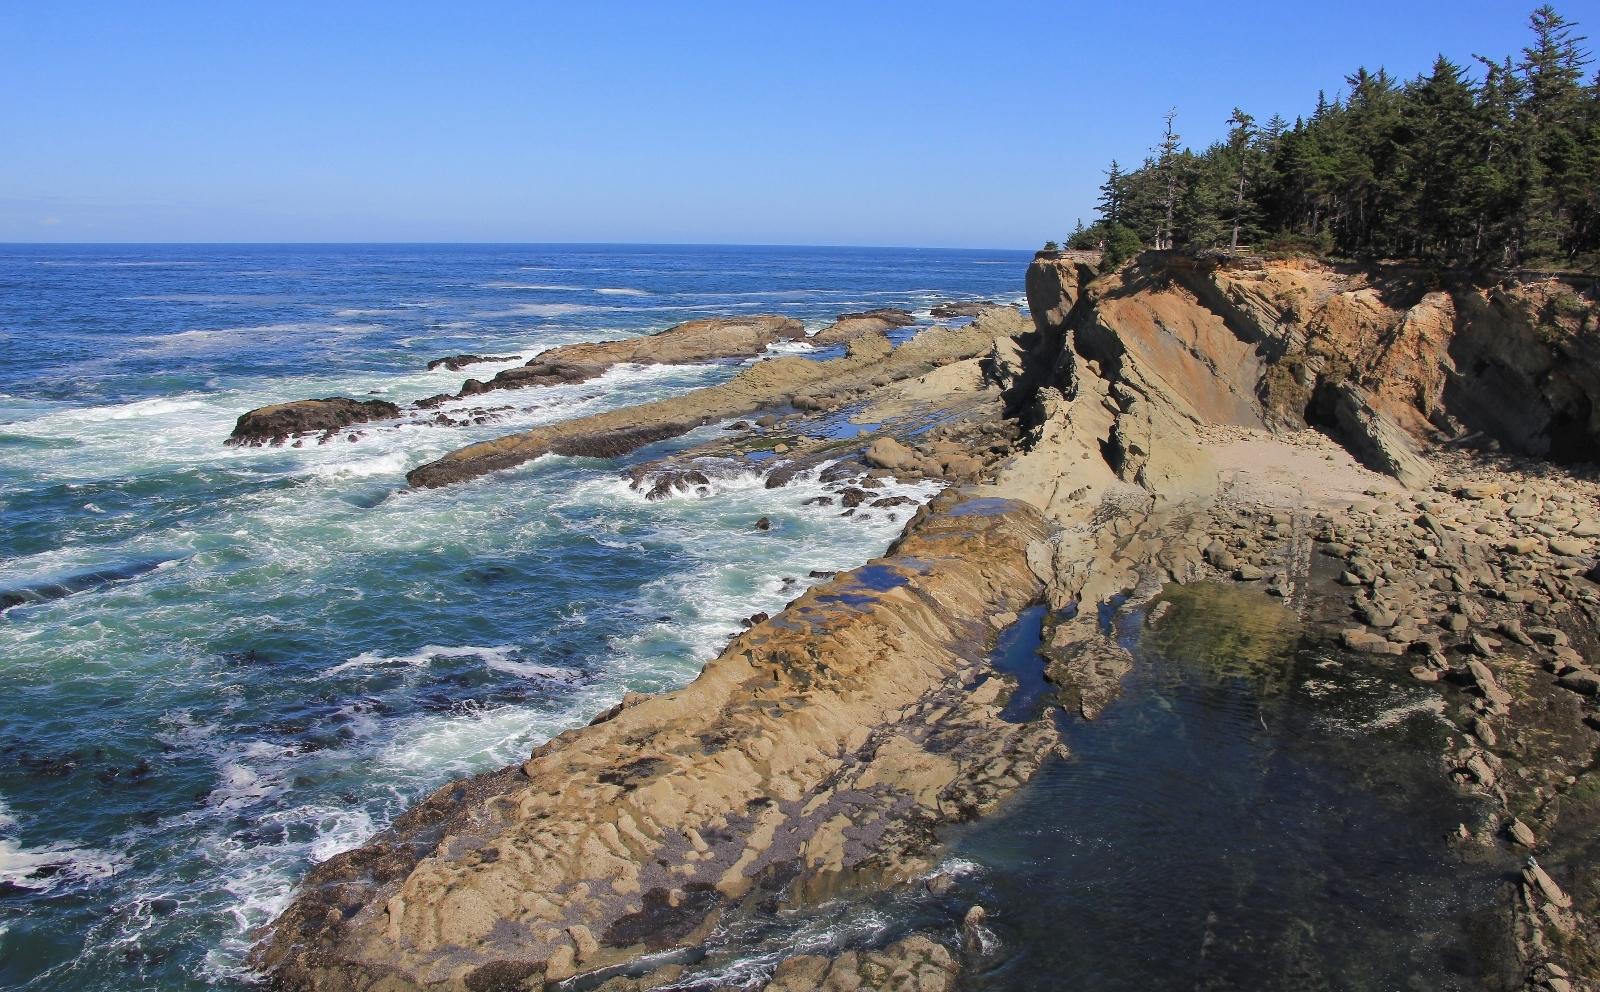 09-04-16-oregon-coast-shore-acres-81